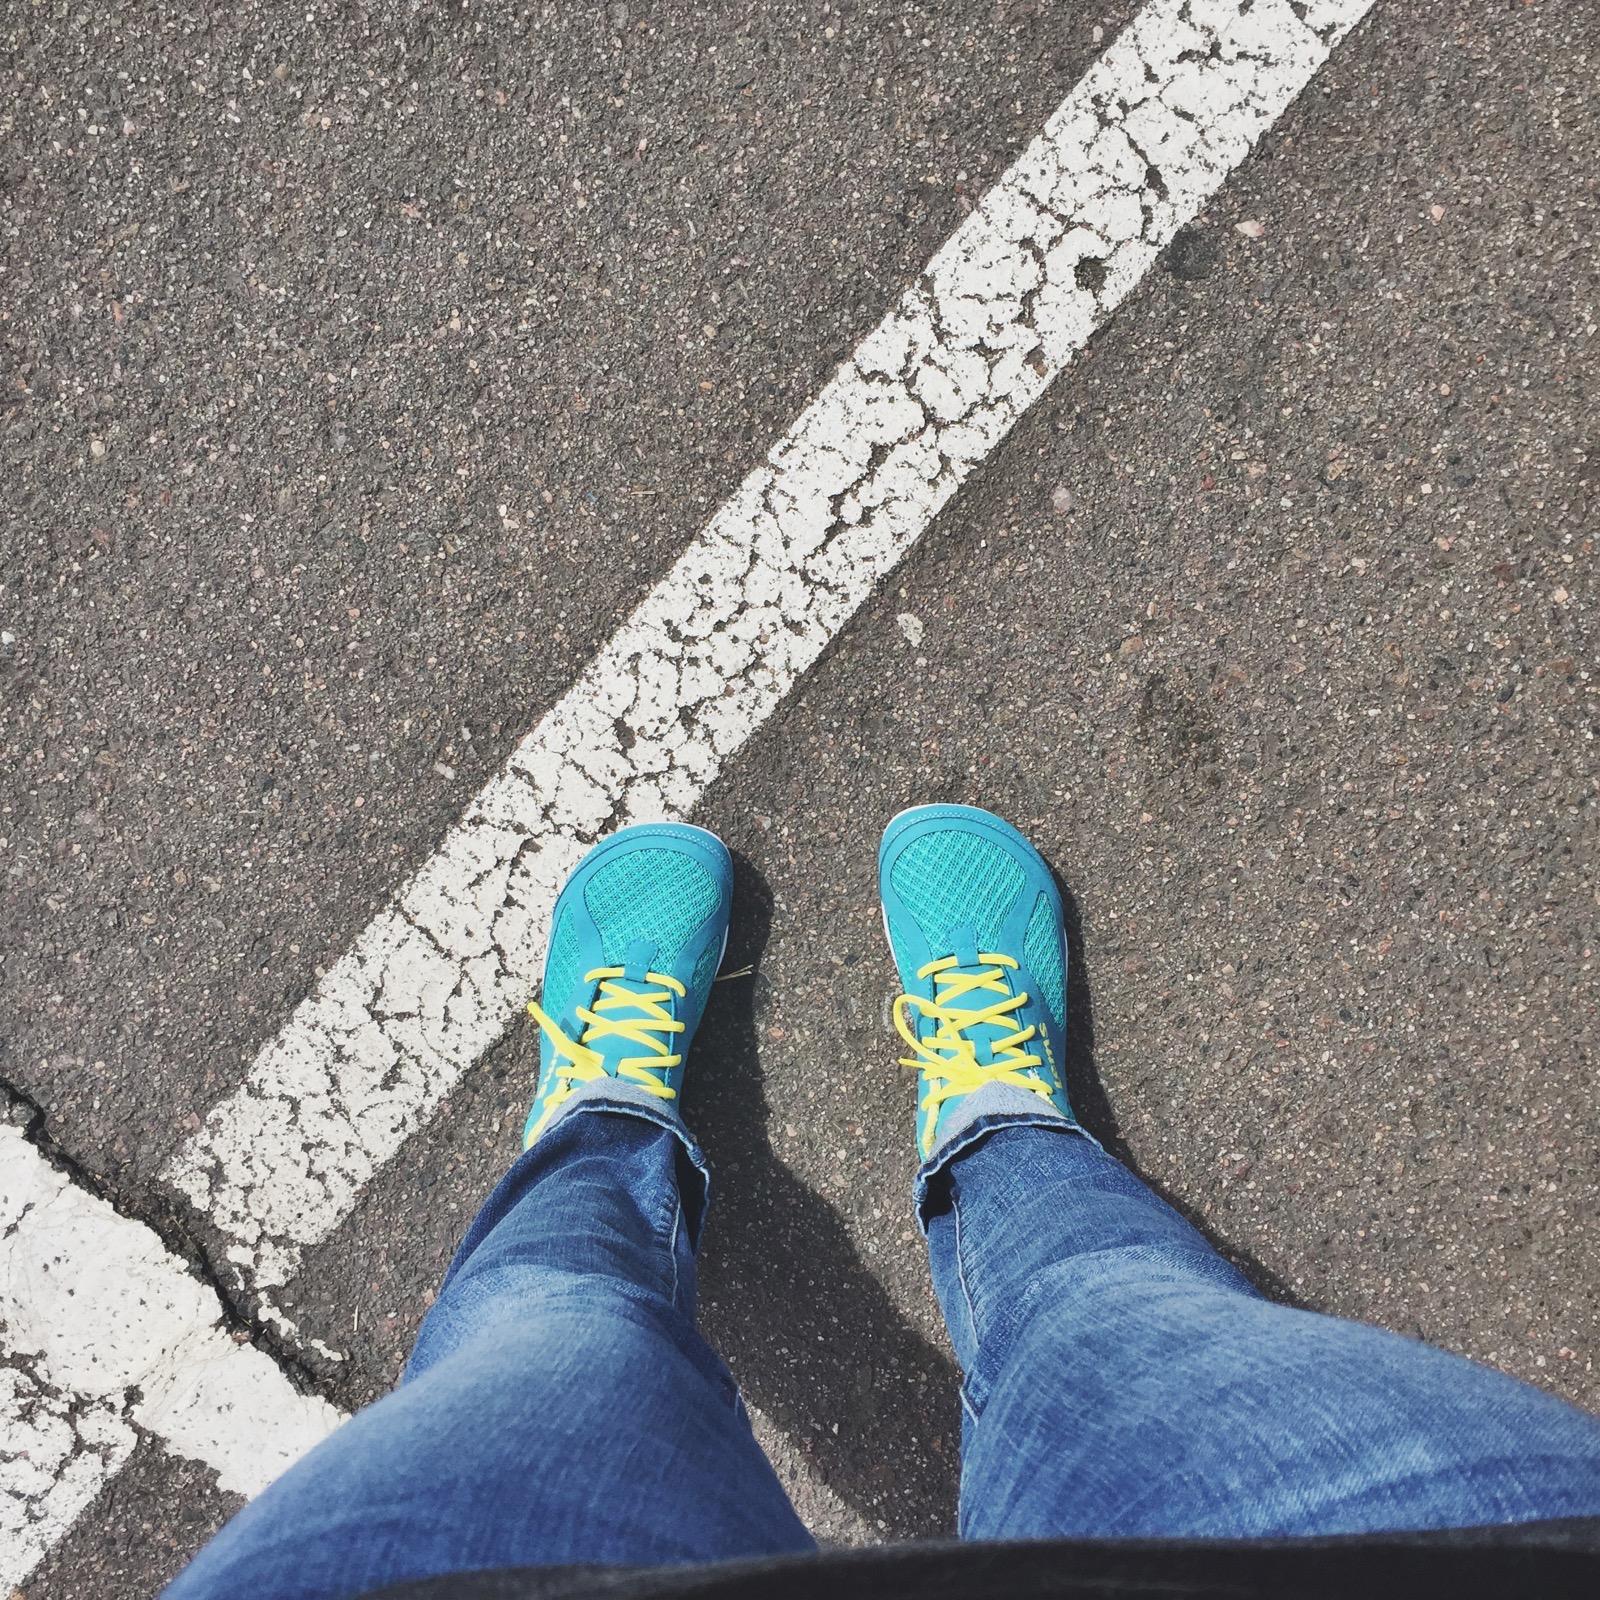 lems-shoes-review.jpg